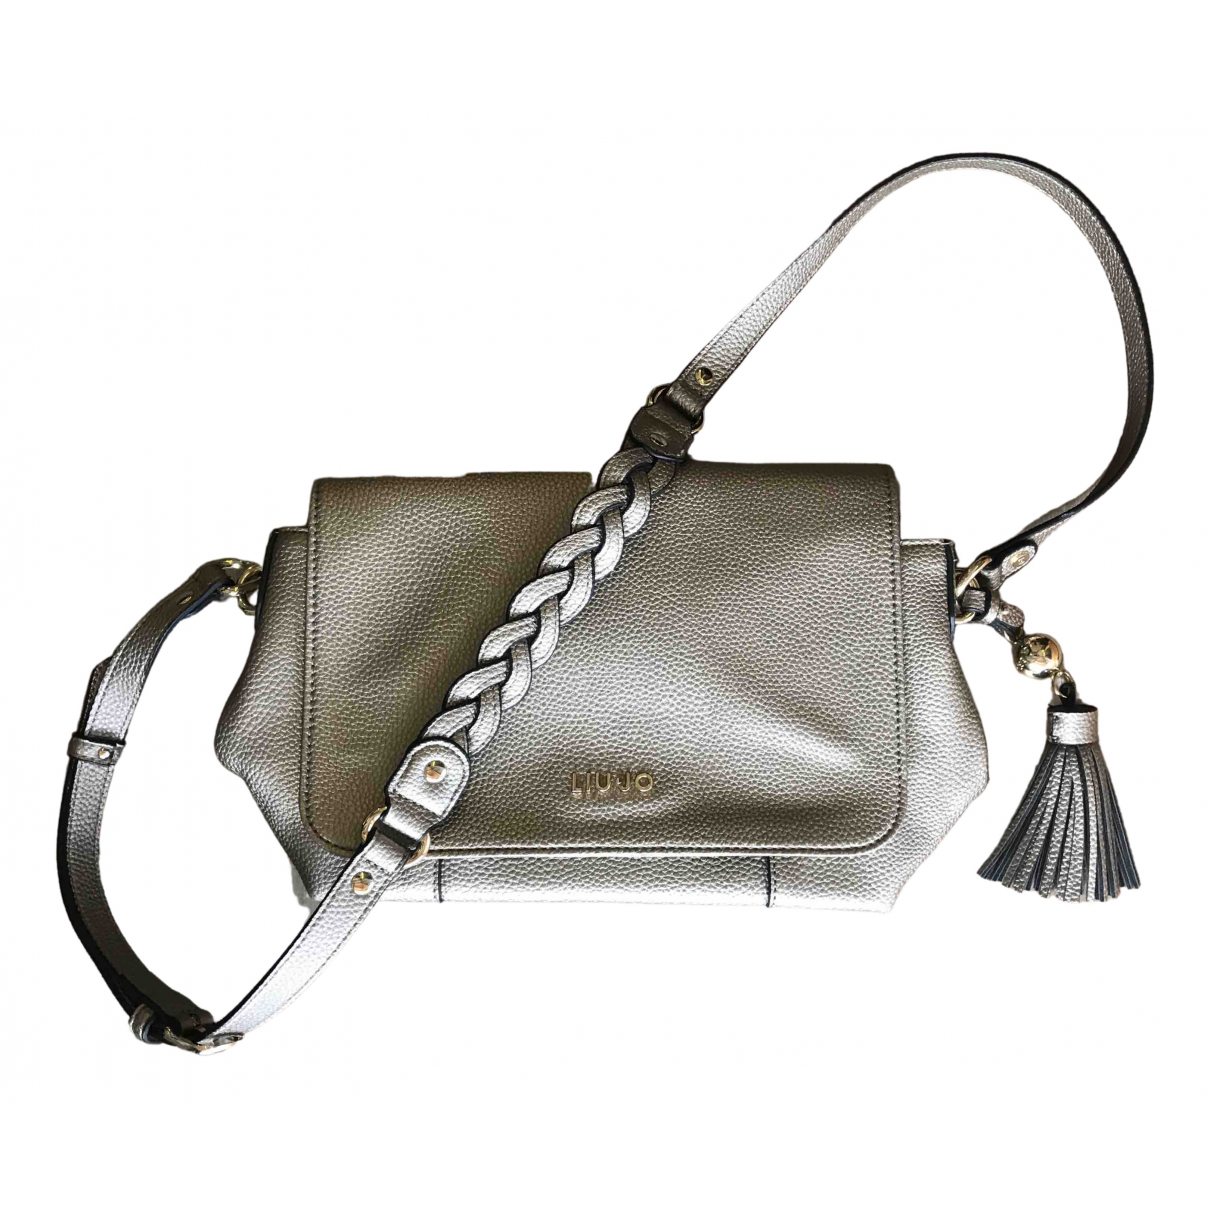 Liu.jo \N Gold Cloth handbag for Women \N